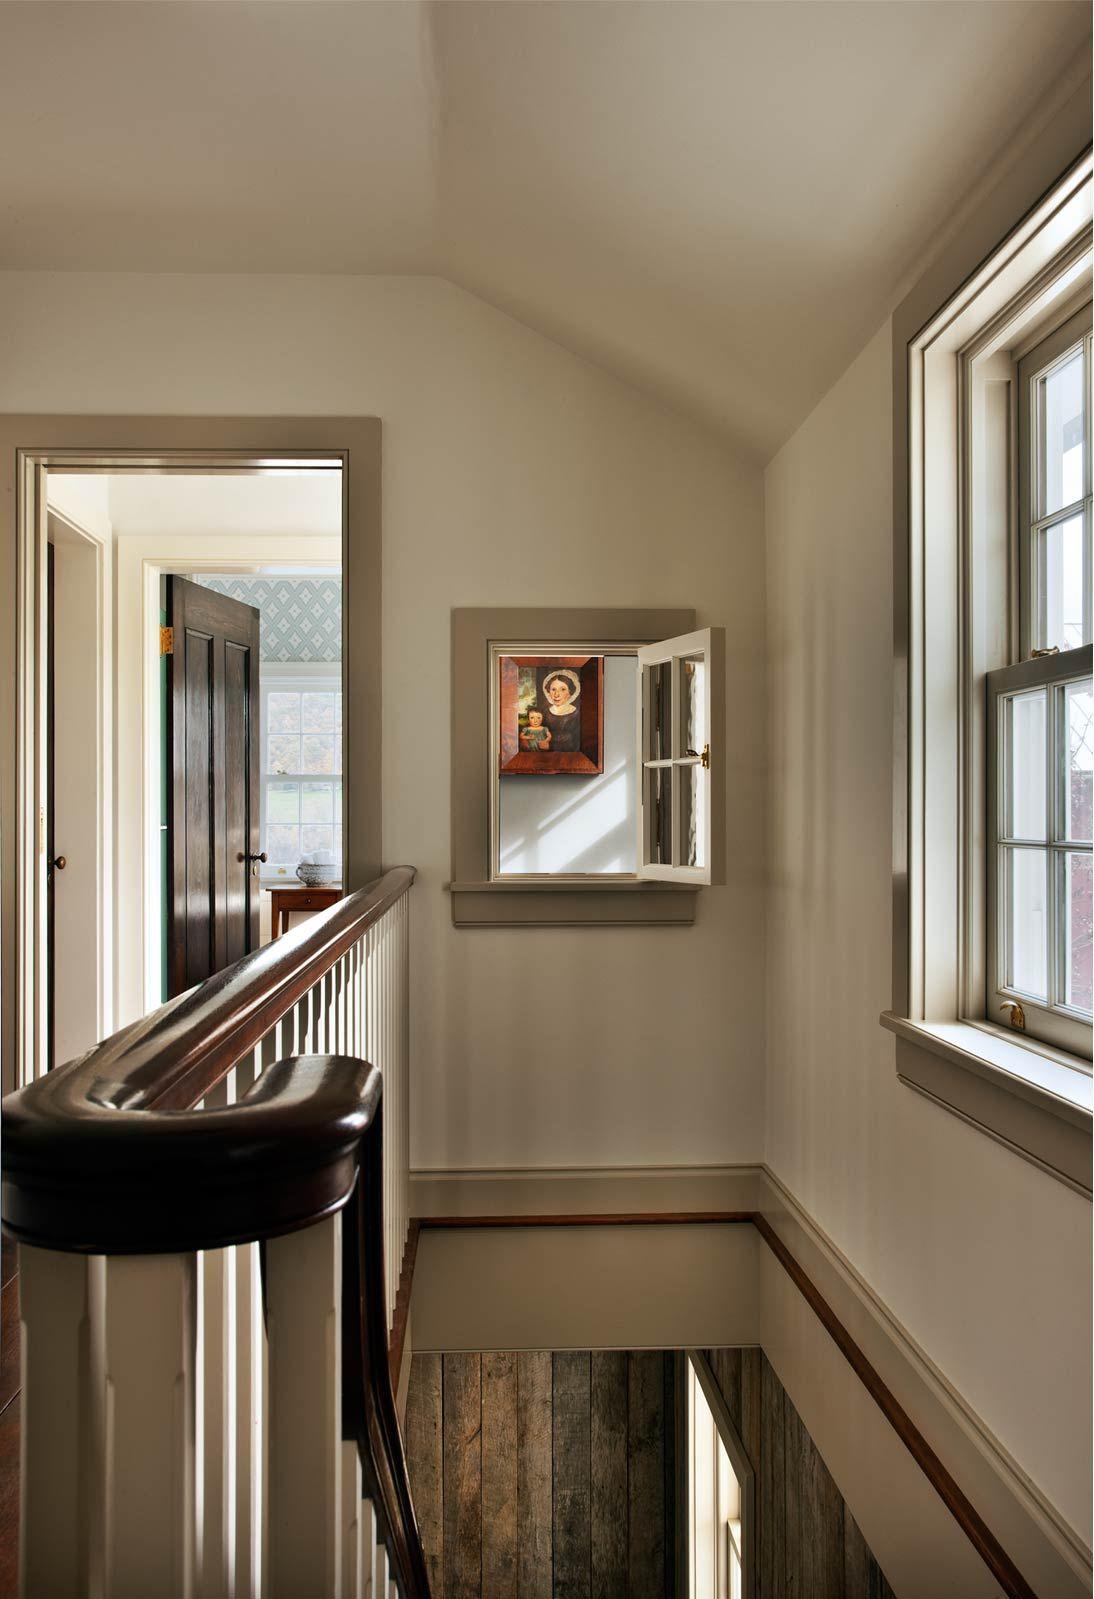 Best Kitchen Gallery: Colonial Interior Design John Murray Architect Colonial Design of American Home Design Windows on rachelxblog.com